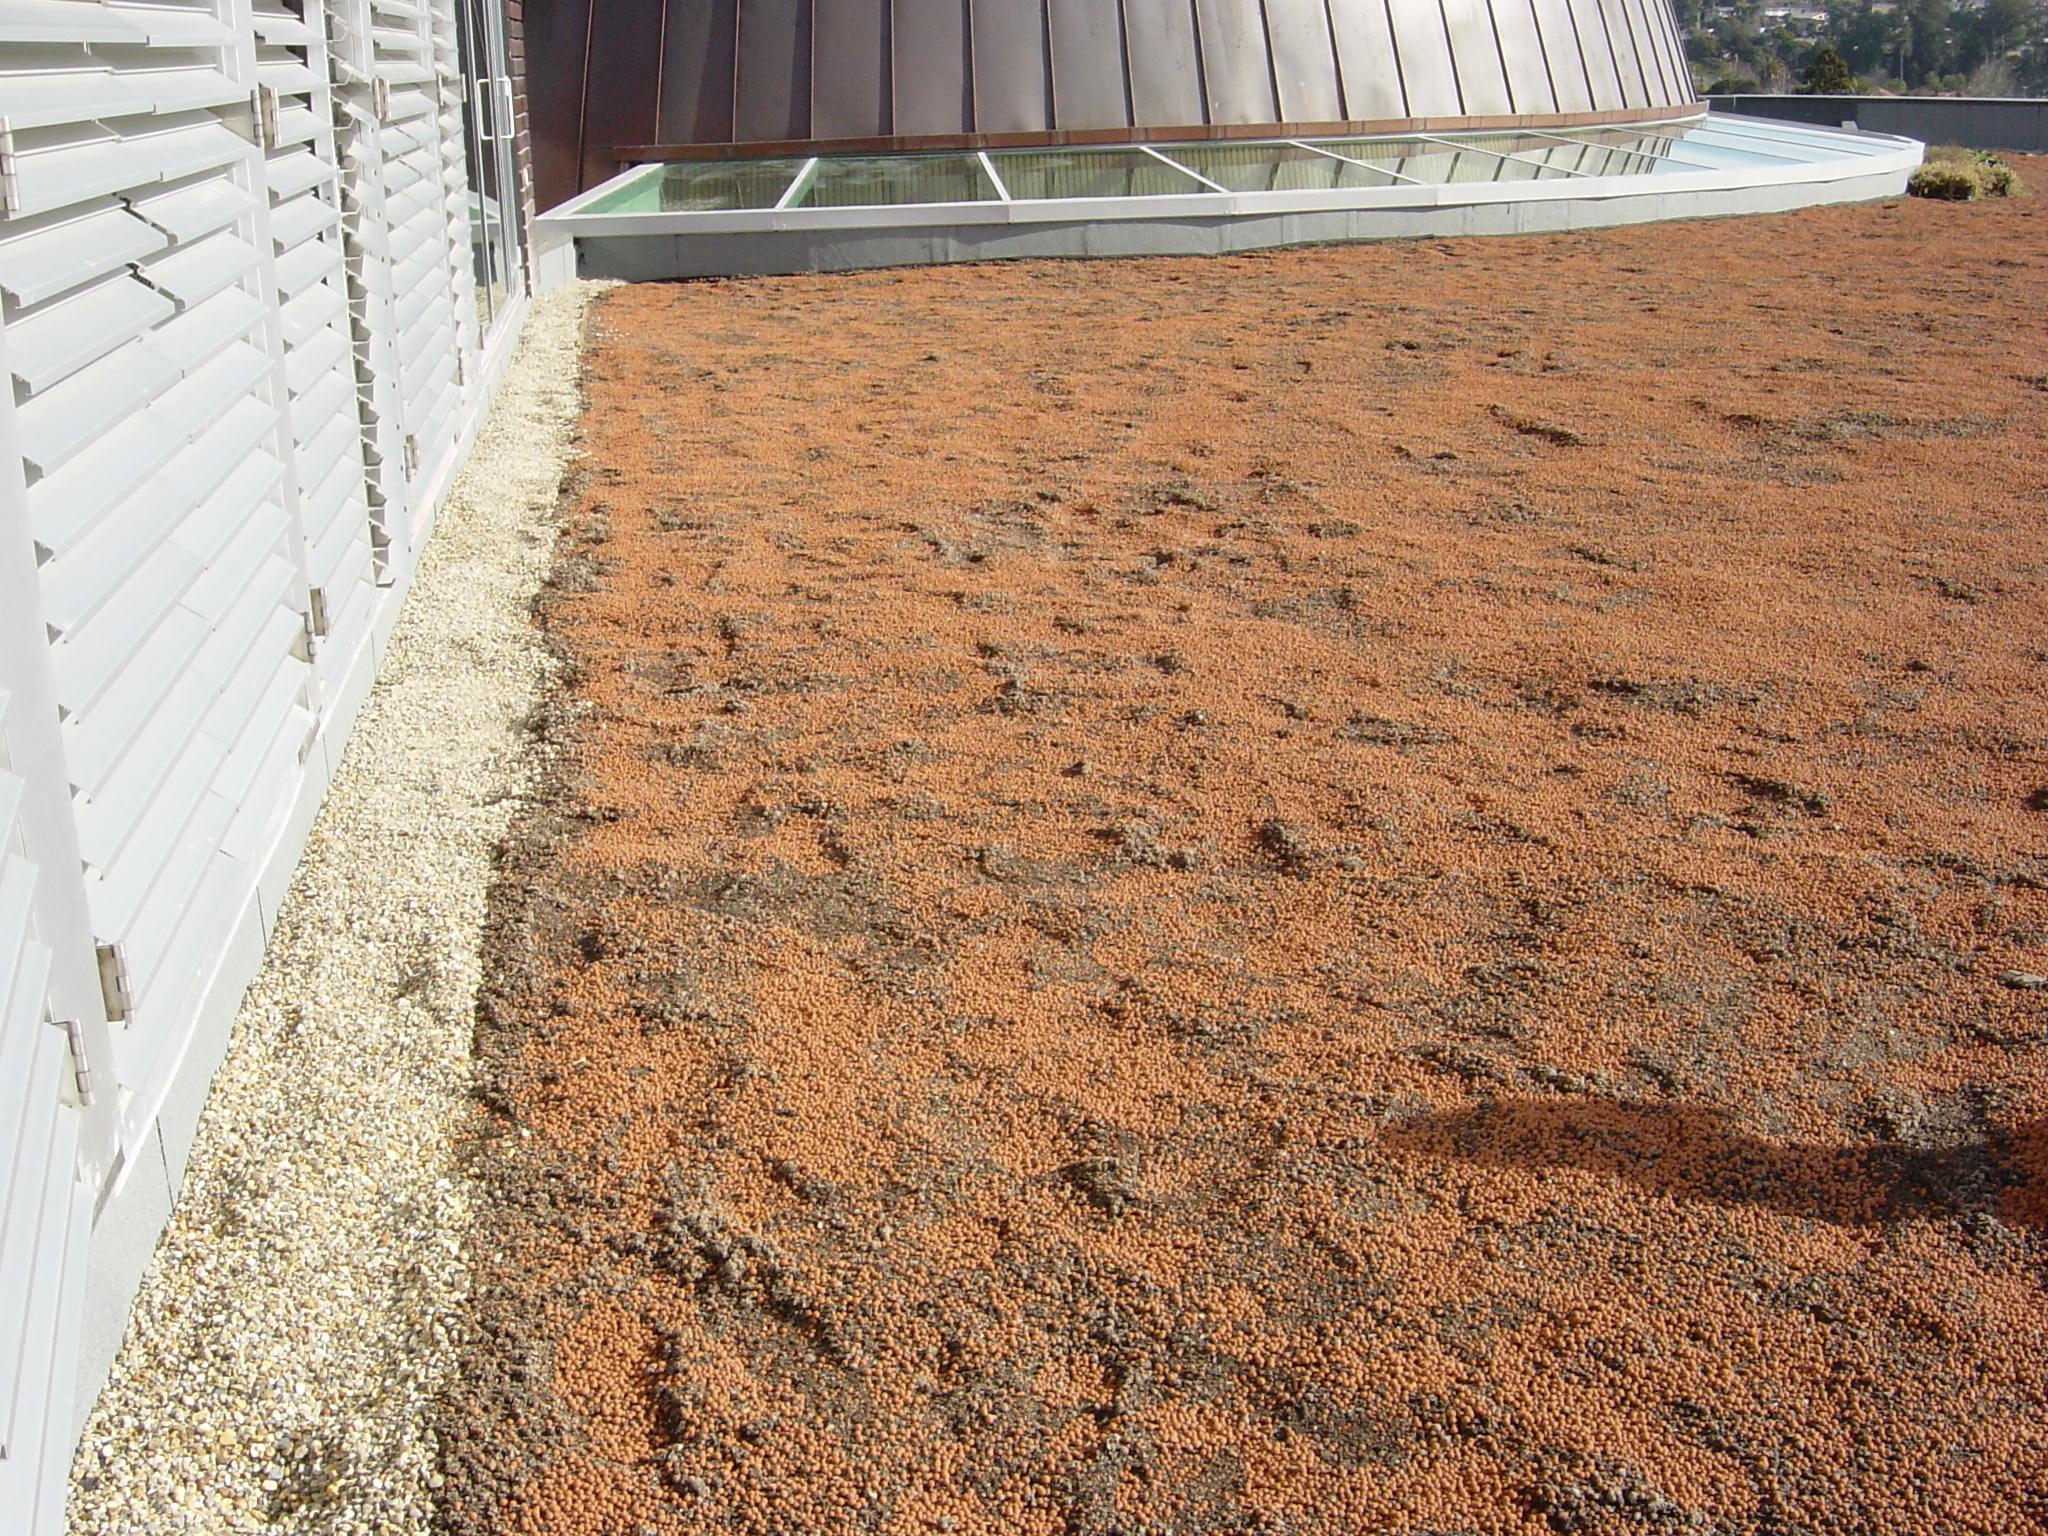 Preparing University green roof